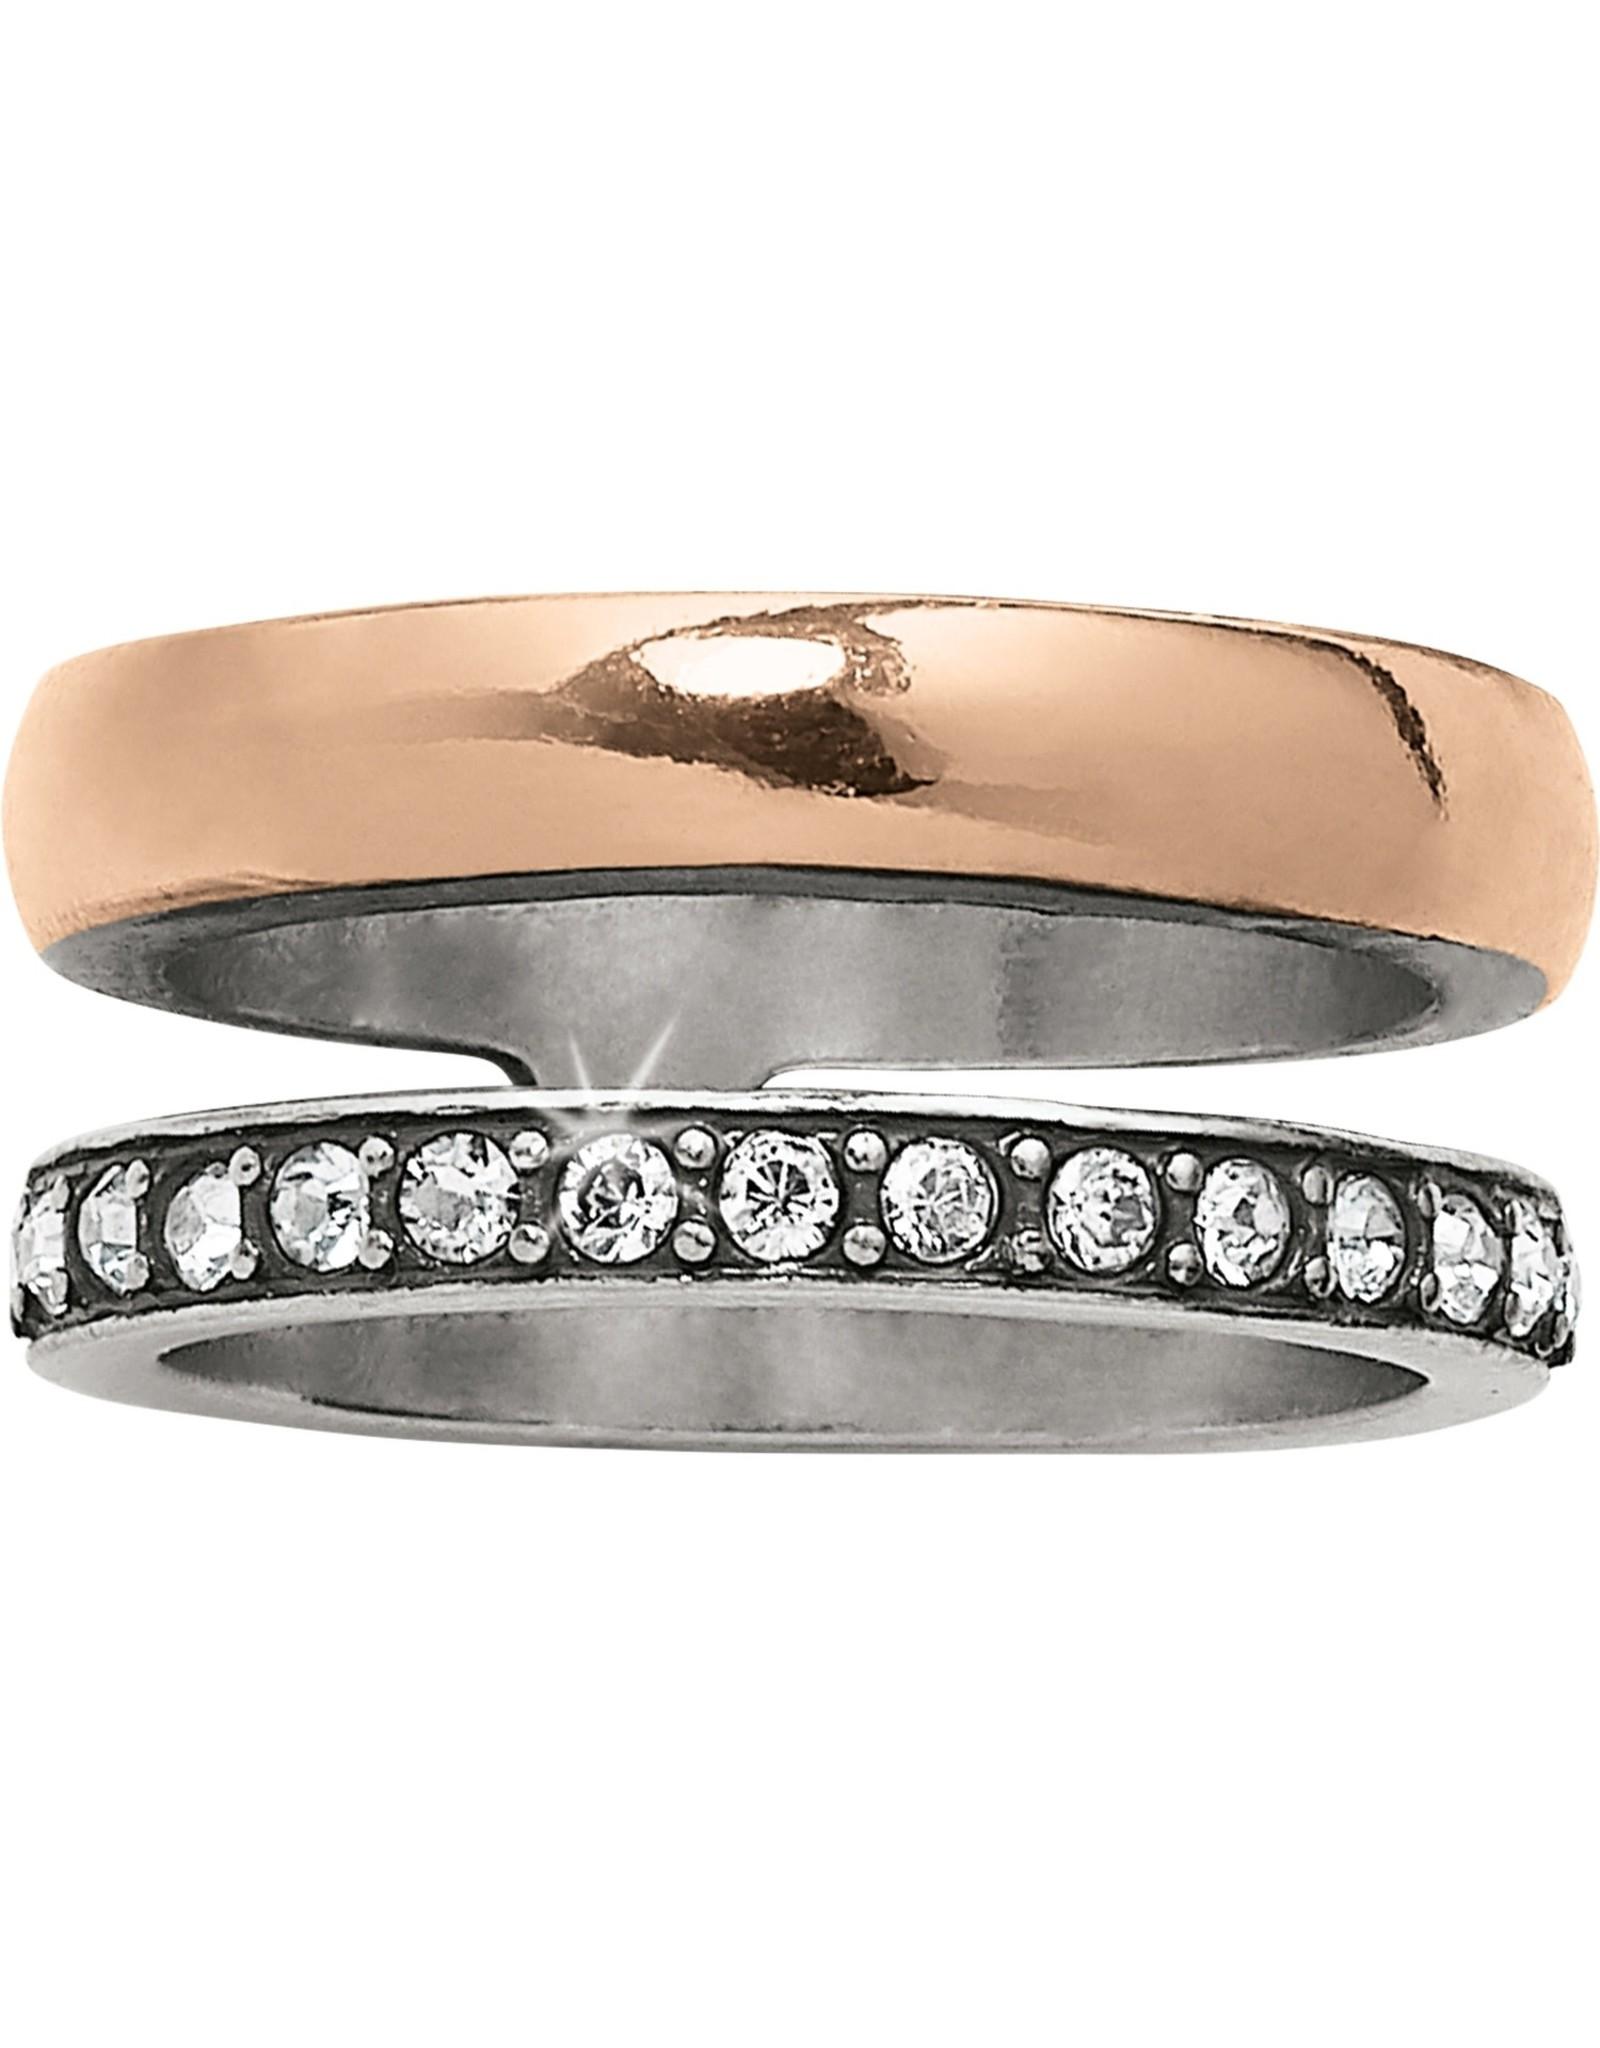 Brighton Neptunes Rings Duo Ring Size 8